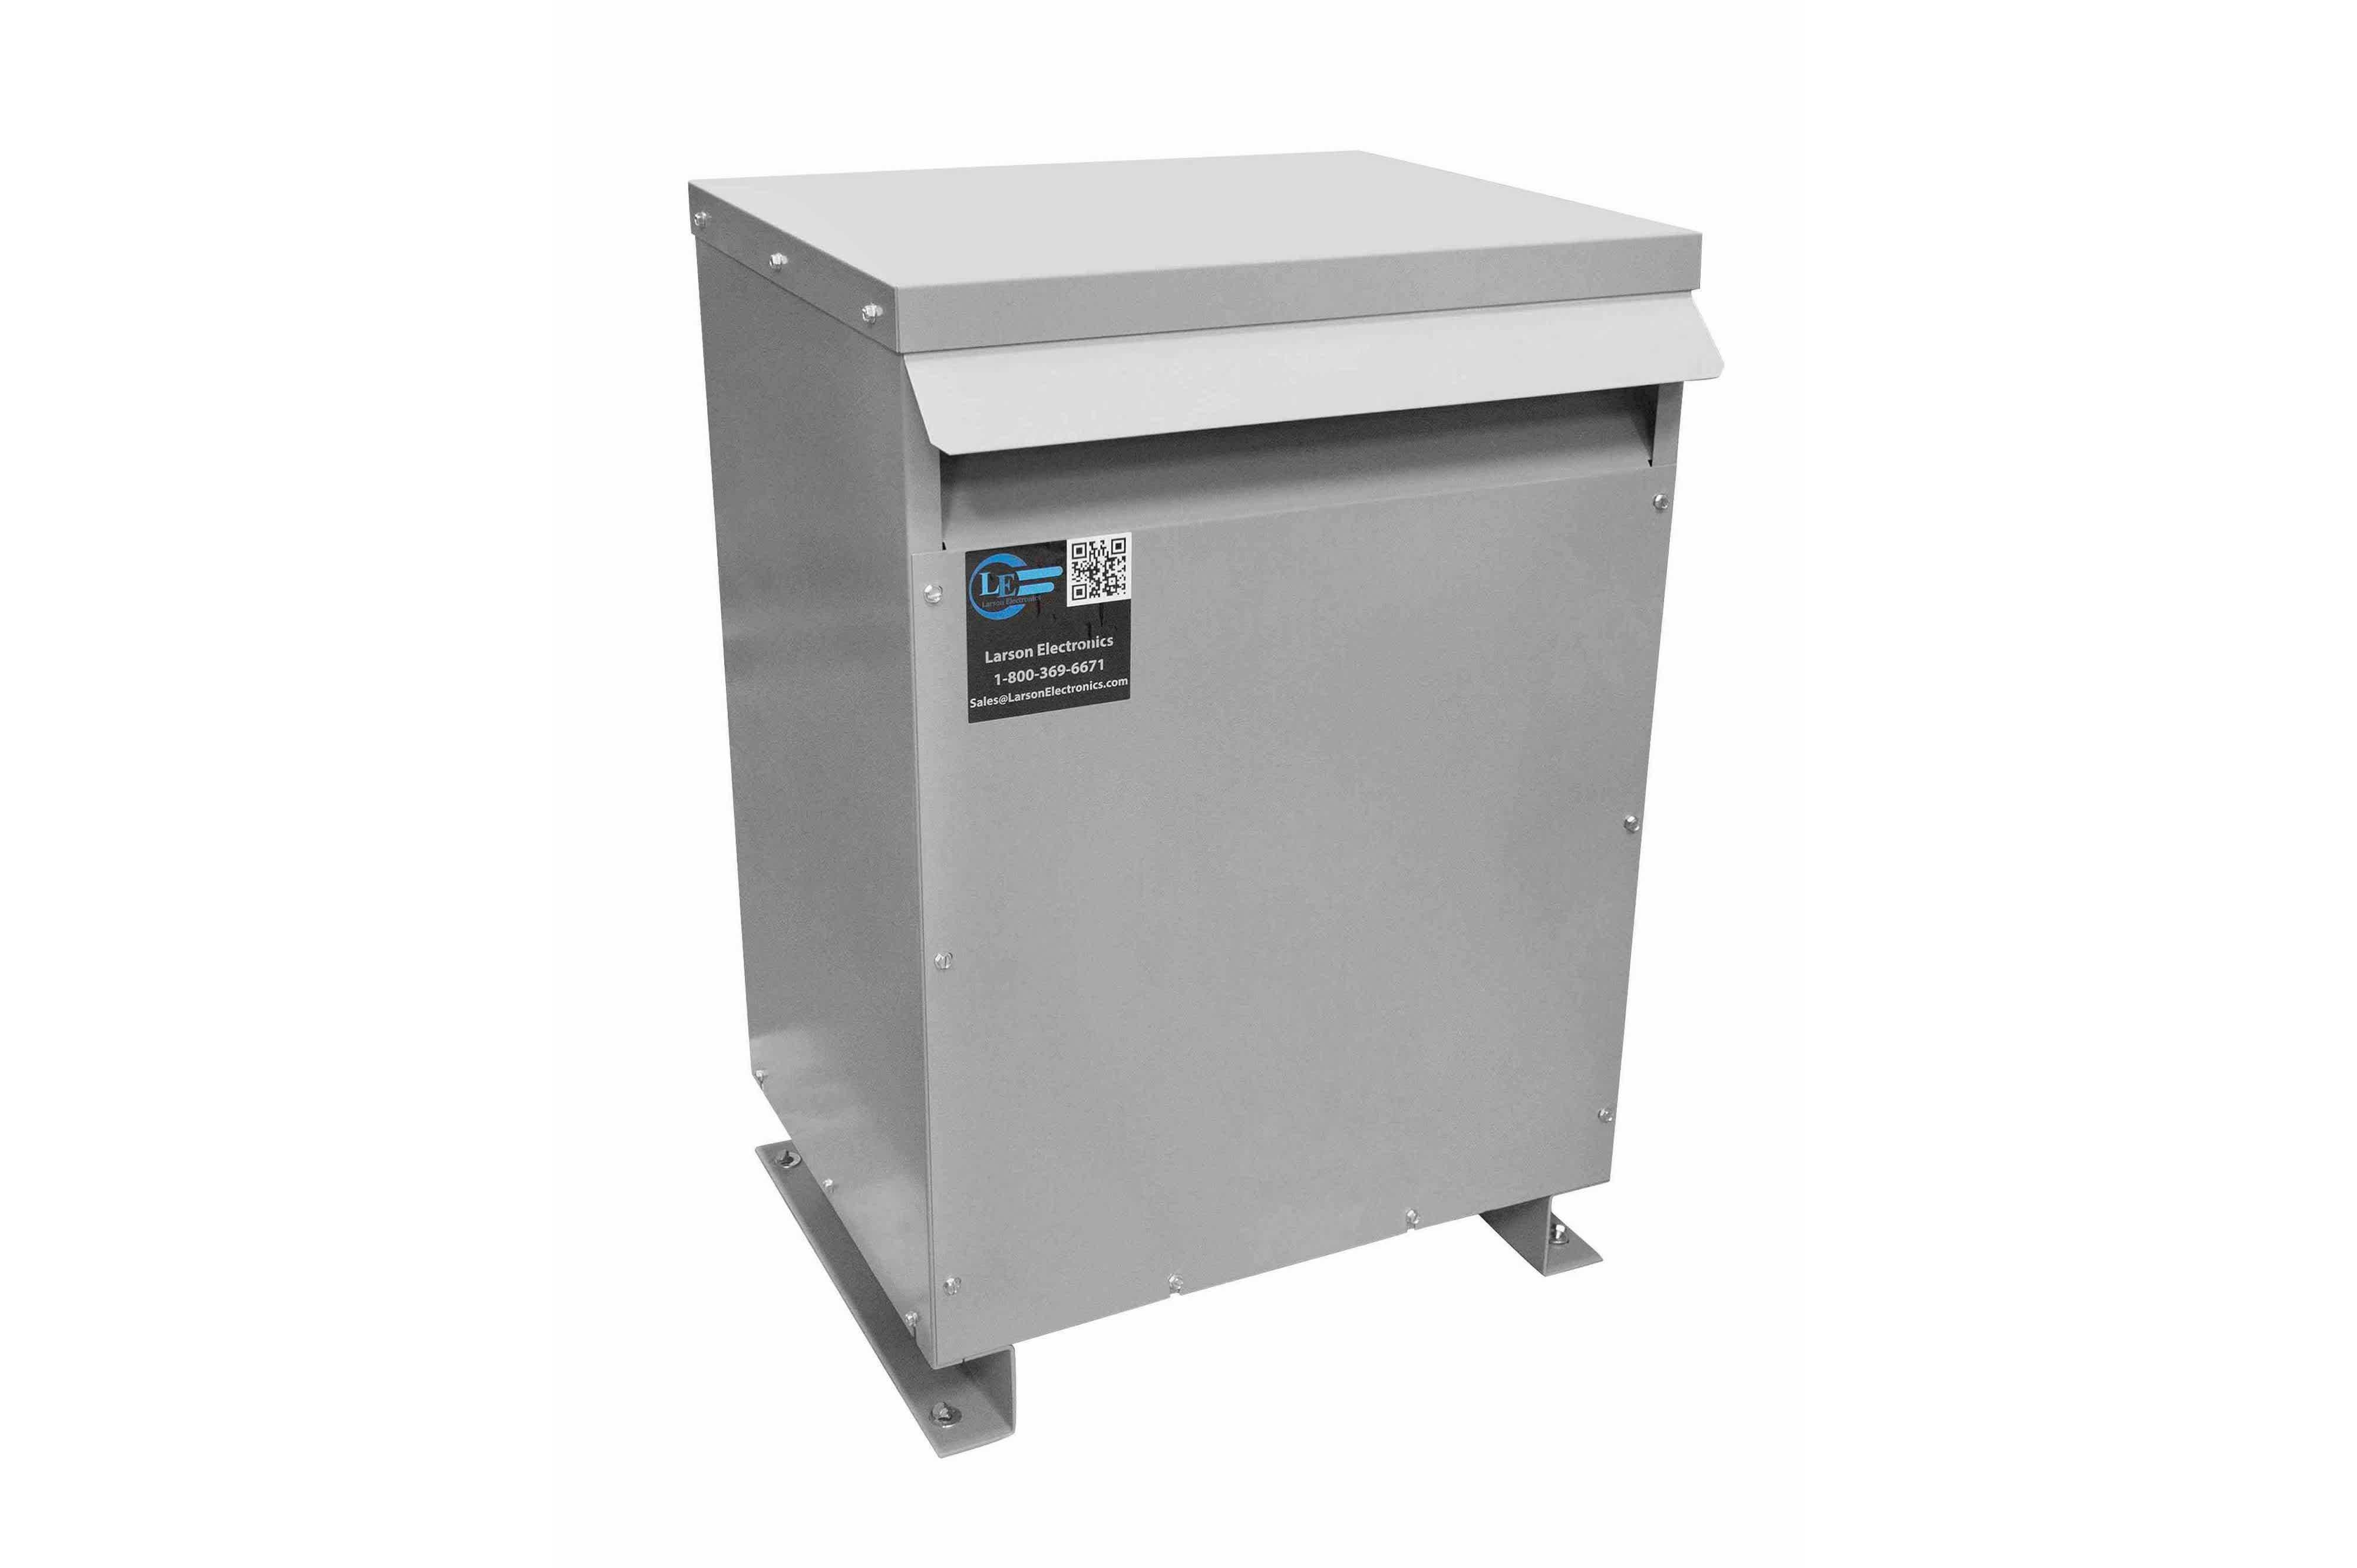 800 kVA 3PH Isolation Transformer, 415V Wye Primary, 600Y/347 Wye-N Secondary, N3R, Ventilated, 60 Hz